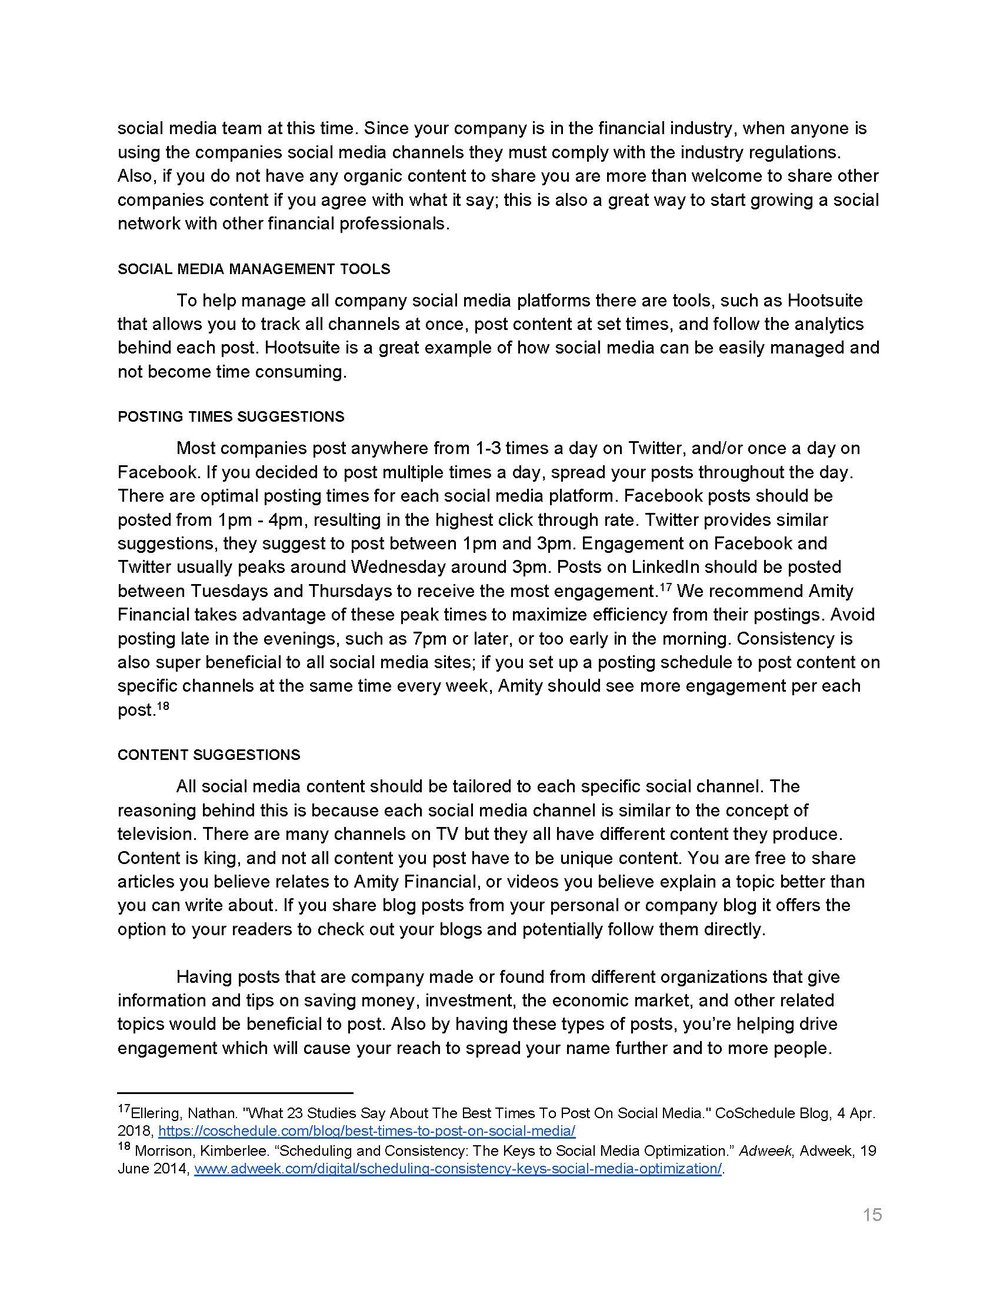 Amity Financial - Social Media White Paper_Page_16.jpg